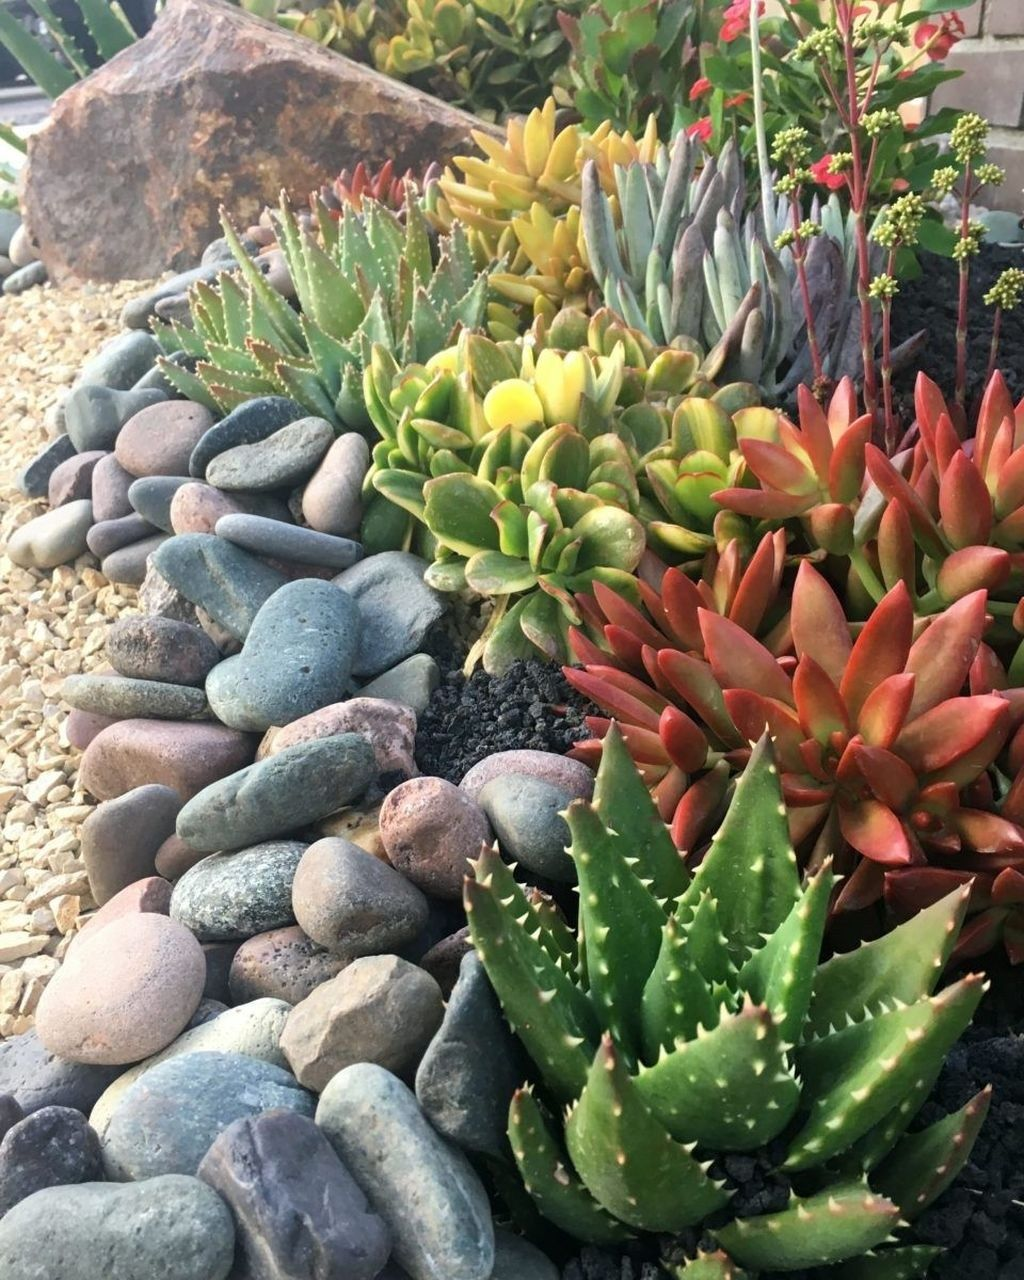 22 Incredible Budget Gardening Ideas: 49 Pretty Rock Garden Ideas On A Budget